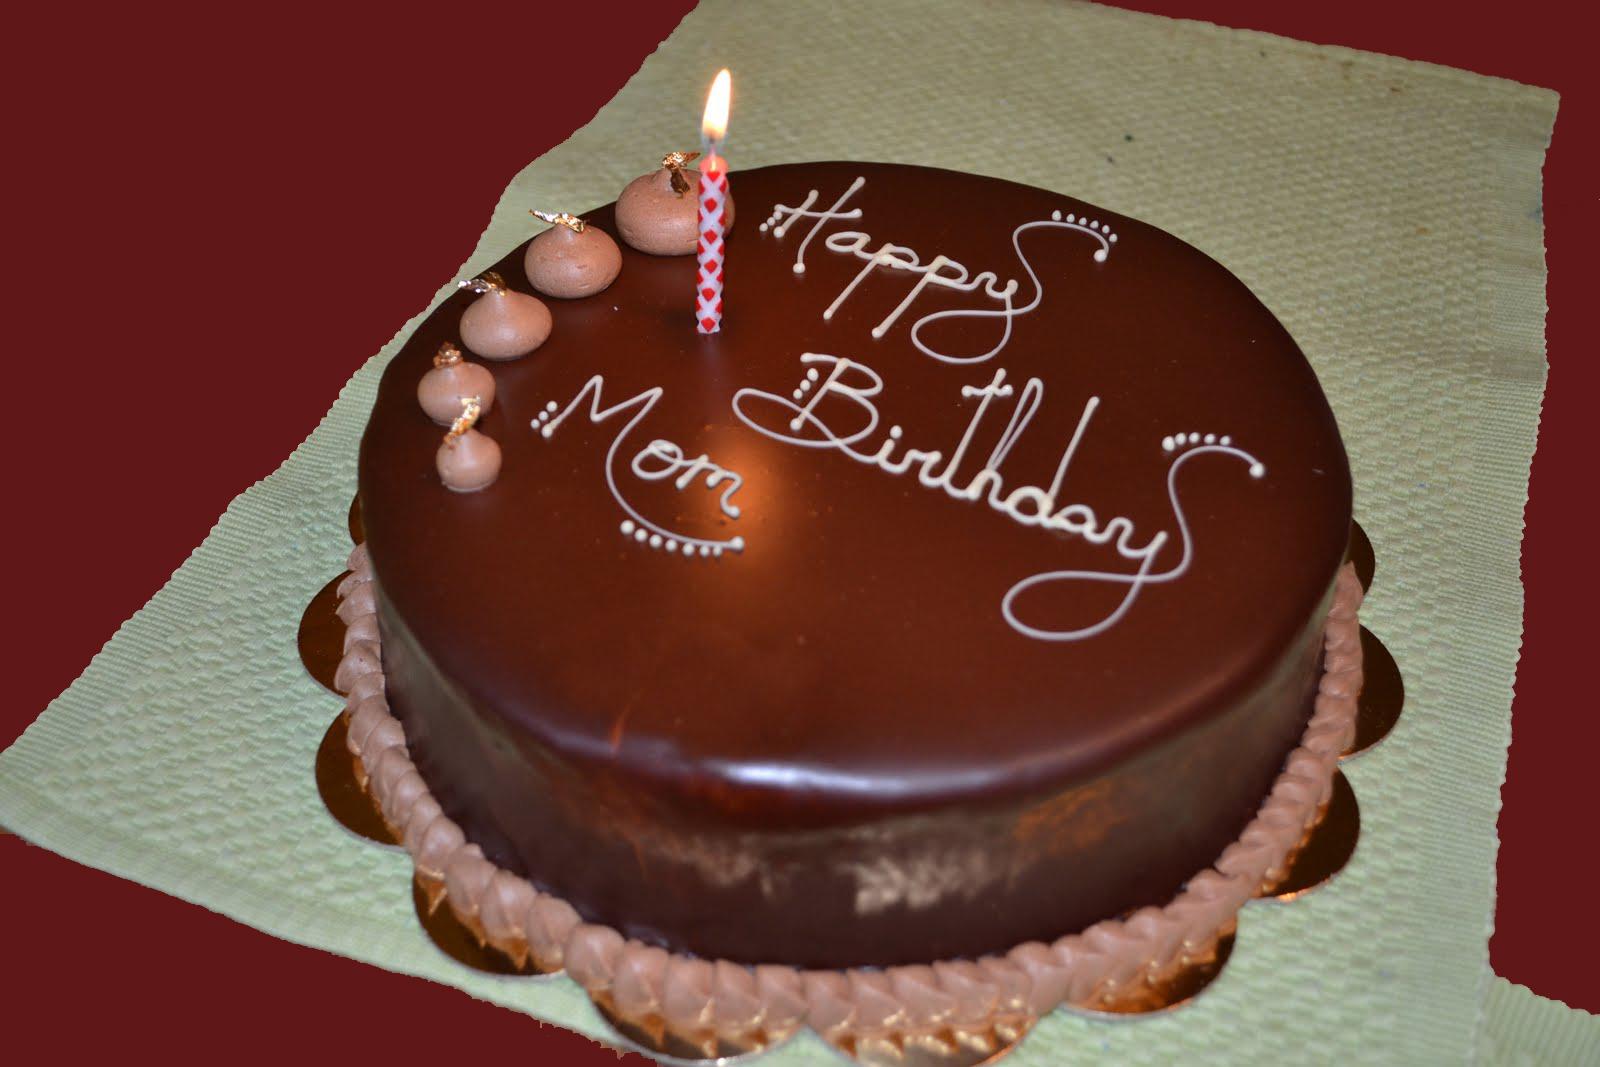 Wish You Happy Birthday Cake With Name Brithday Cake